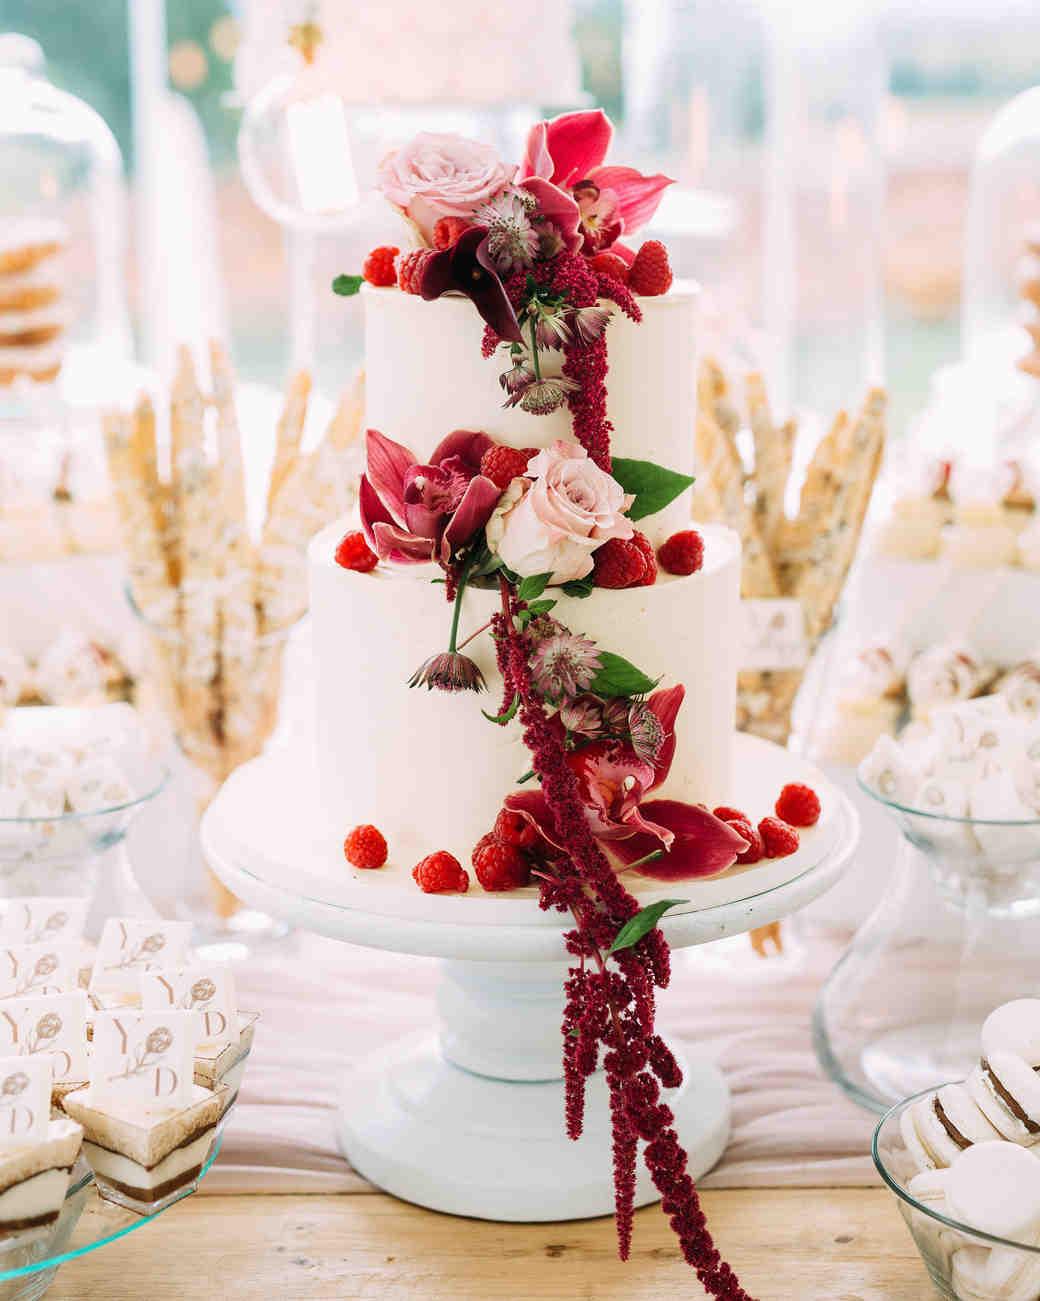 yolana douglas wedding cake with berries and flowers